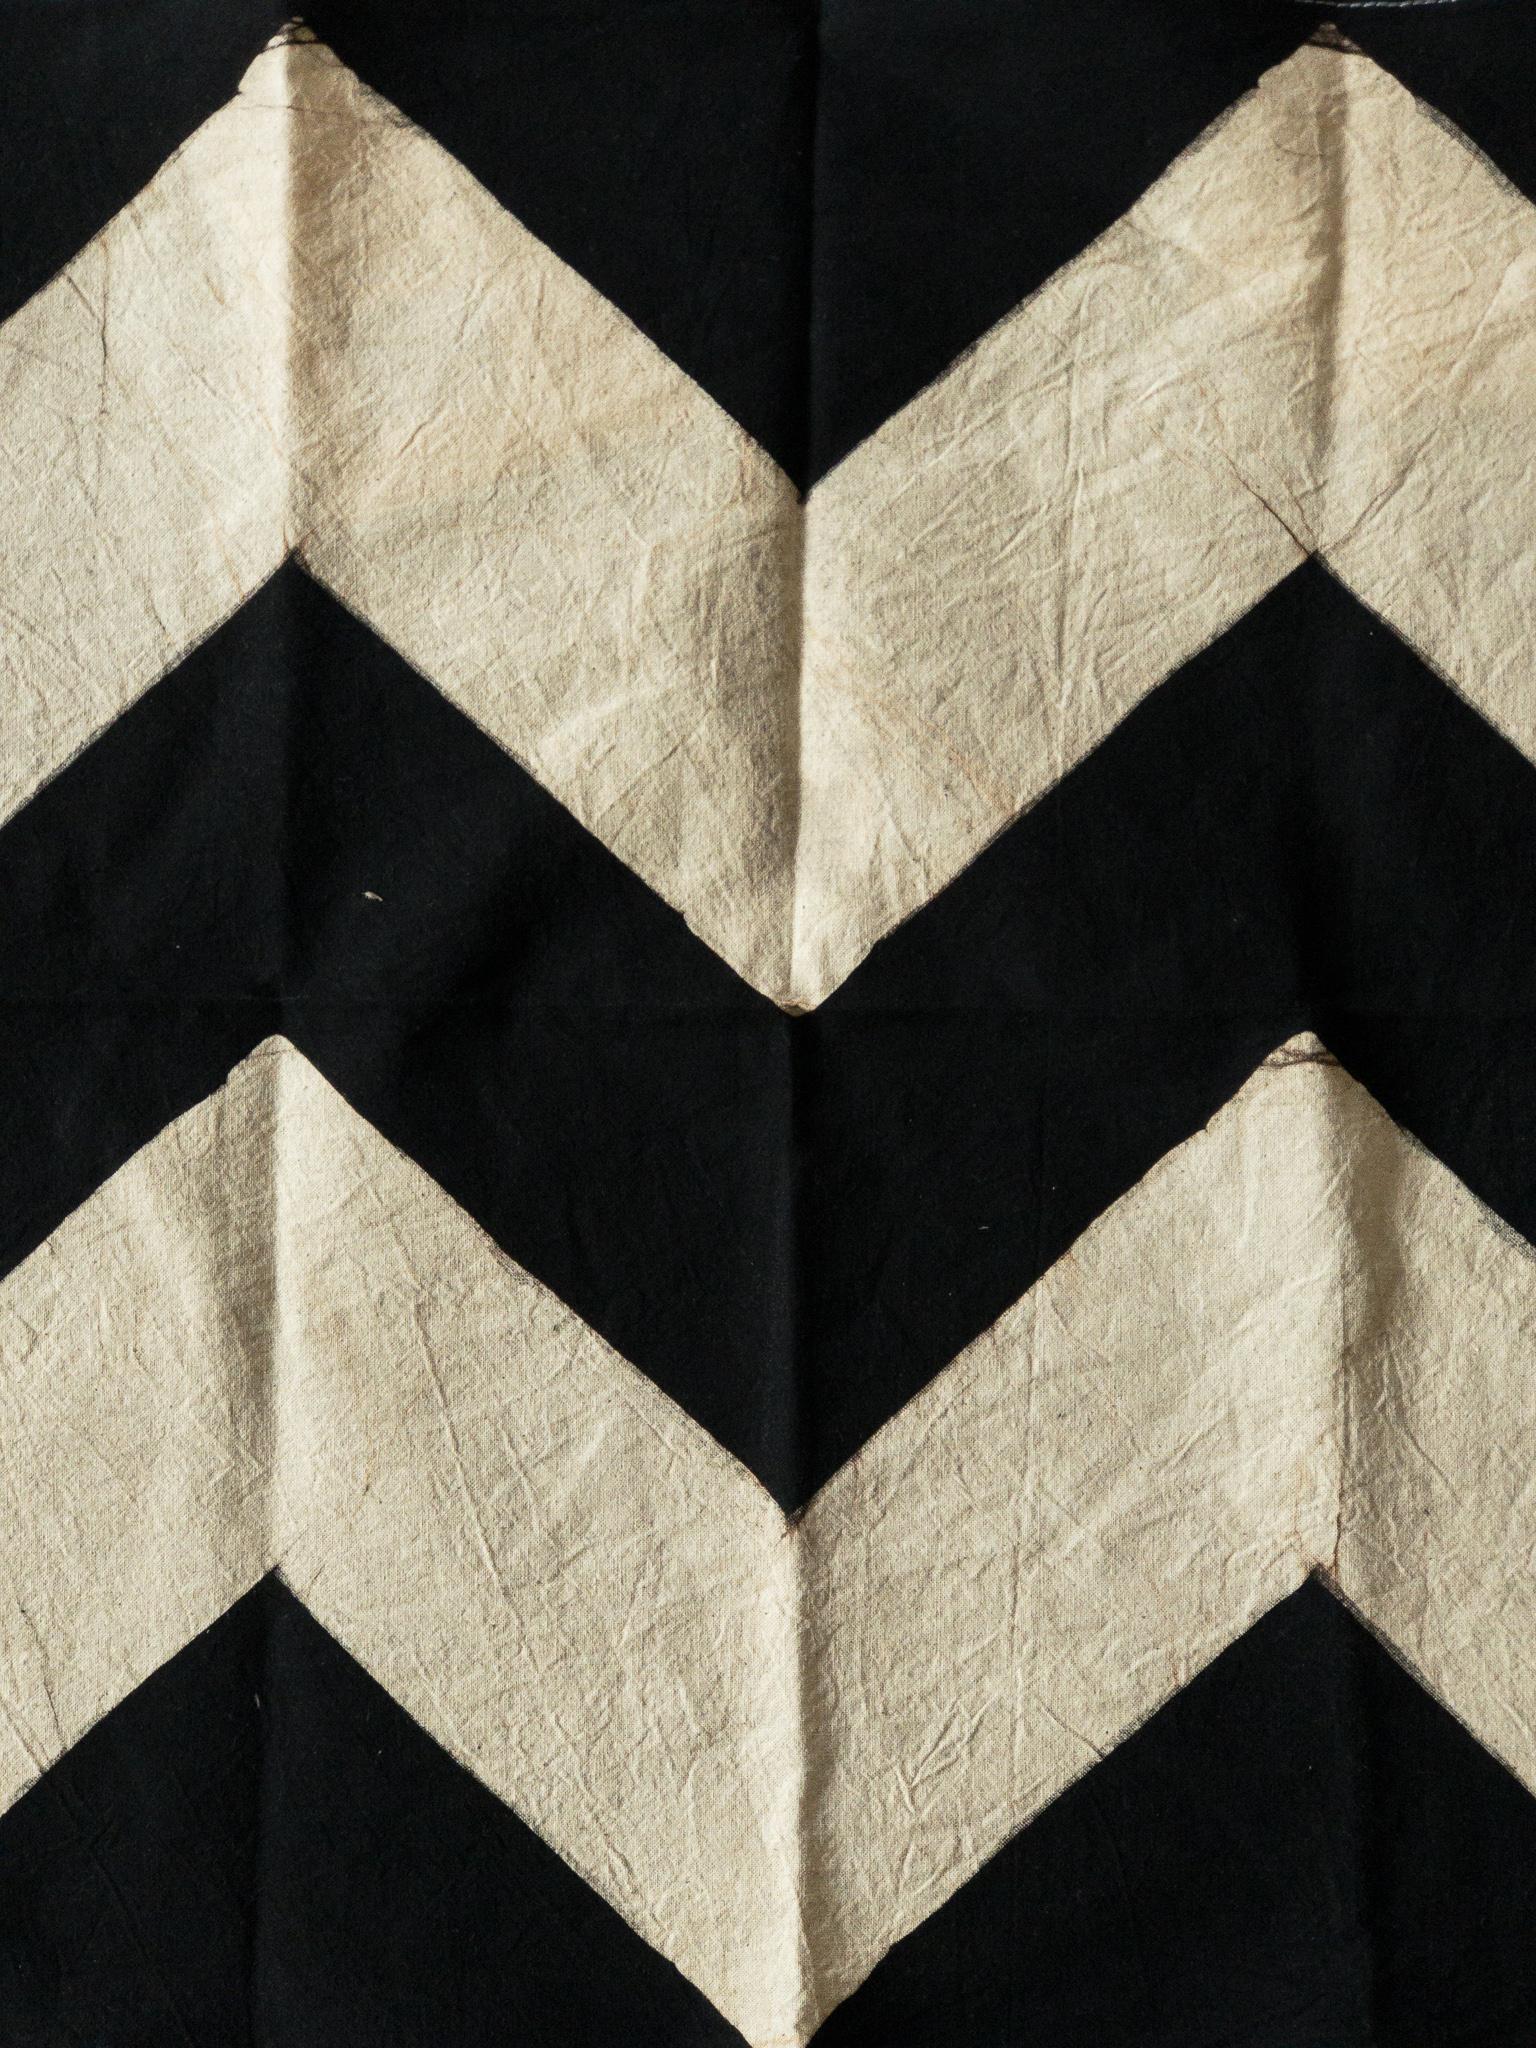 Colombo shopping guide - Paradise Road signature pattern batik textiles